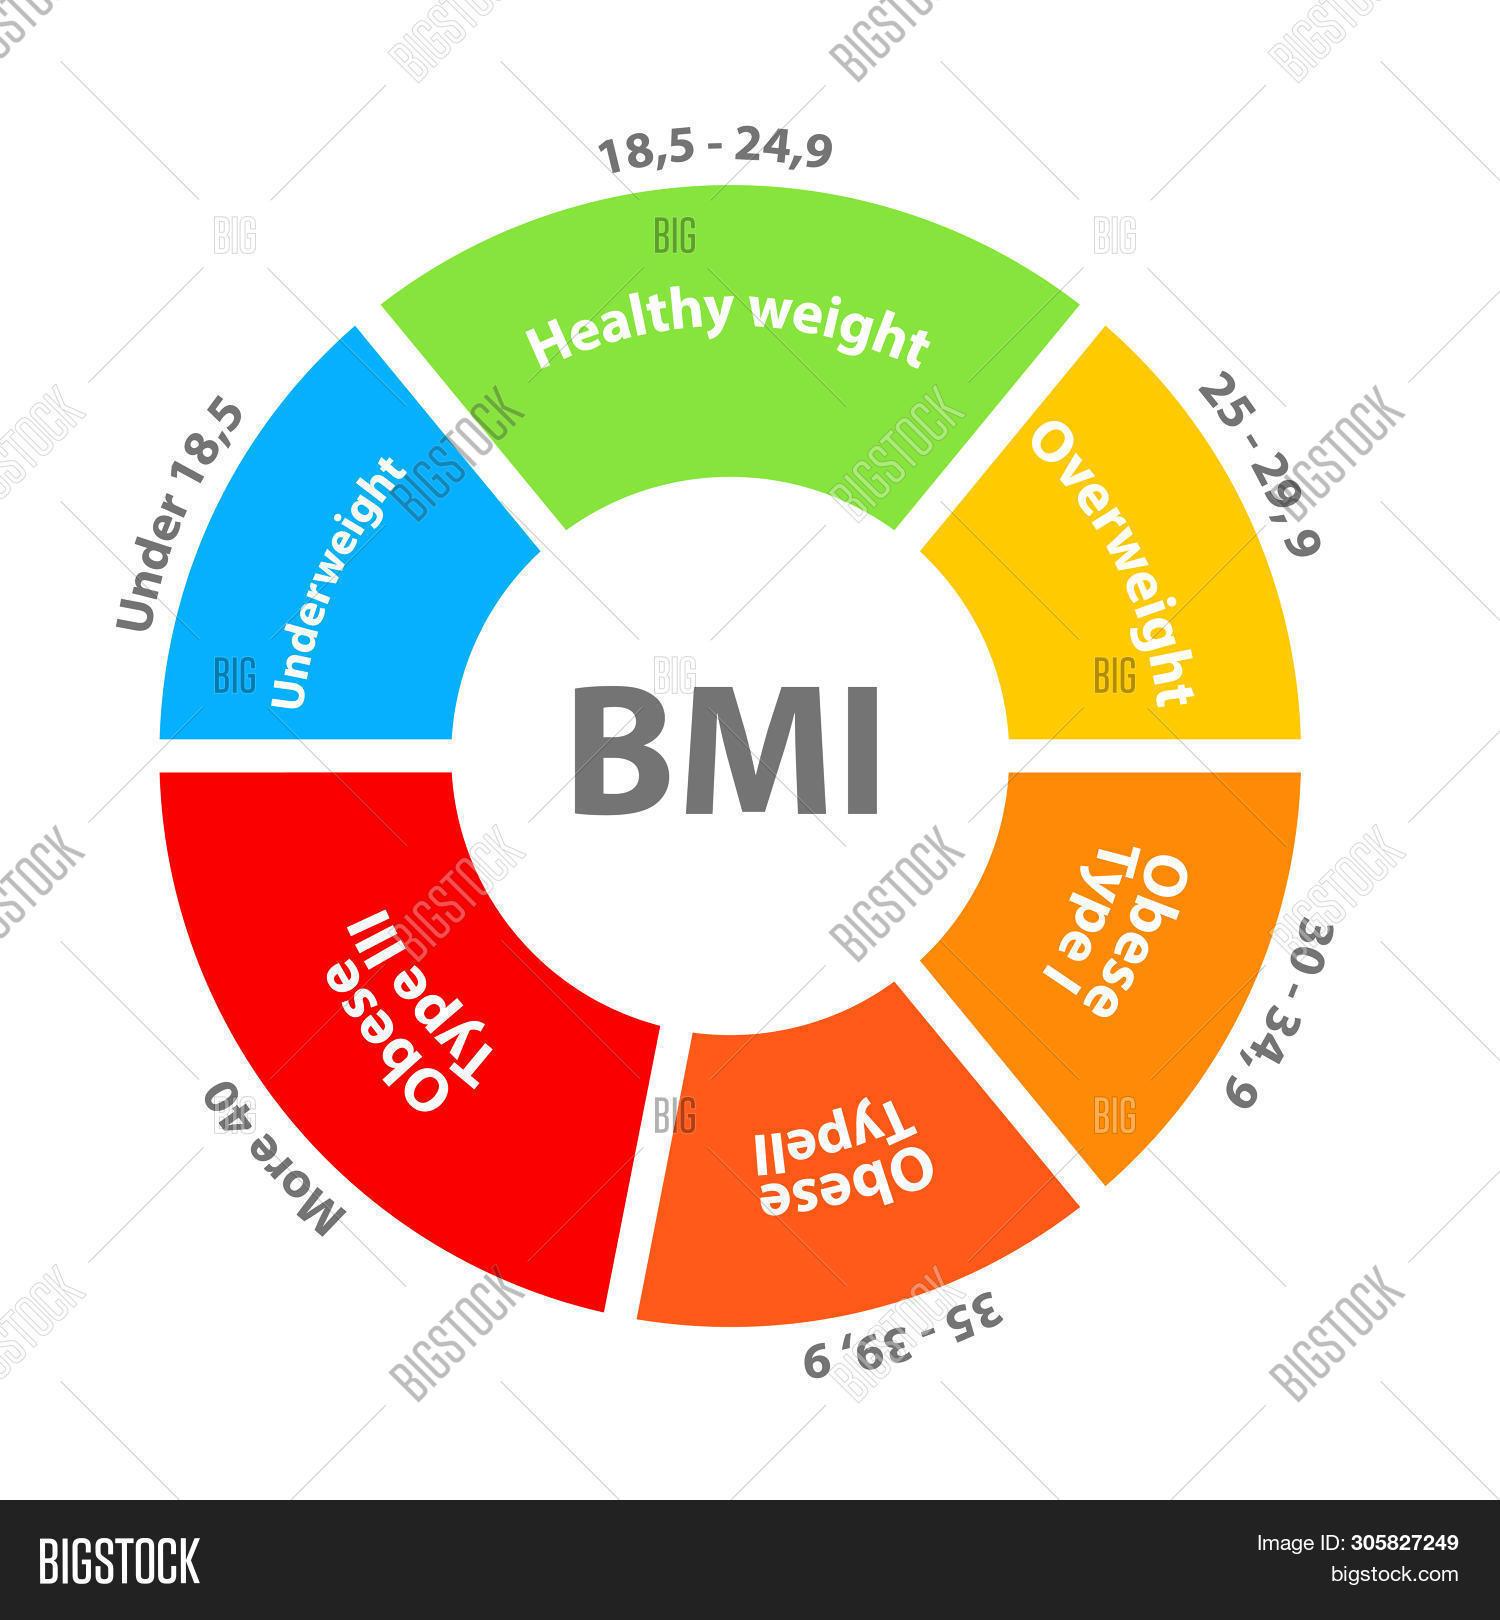 BMI Body Mass Index Image & Photo (Free Trial).